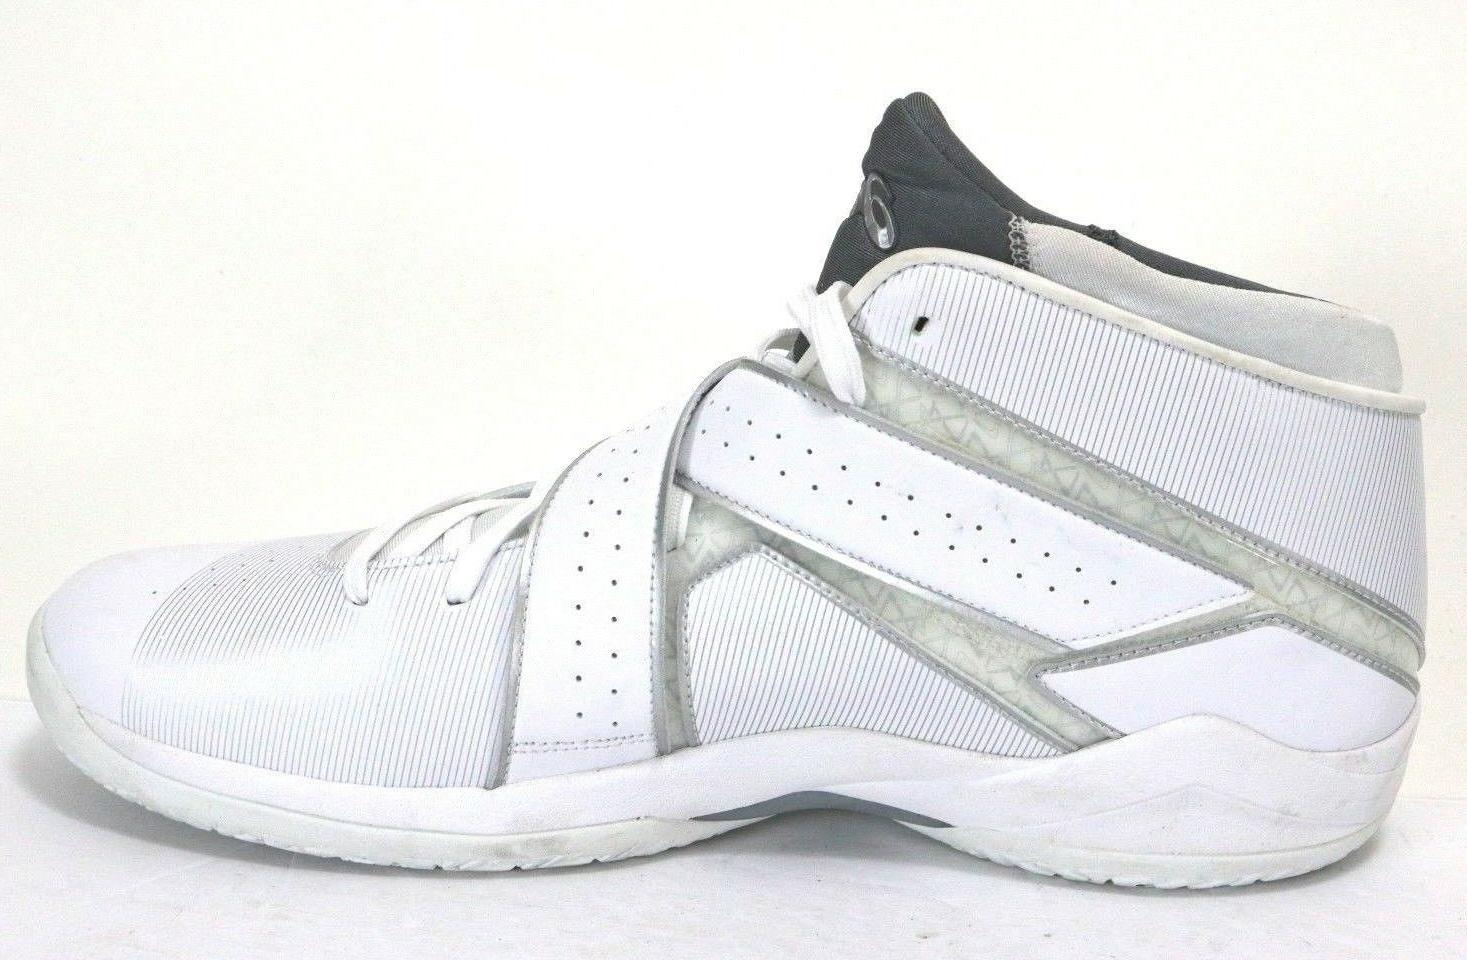 Asics NEW Naked EG02 $120 Men's Hi-Top Basketball Shoes Size Leather White